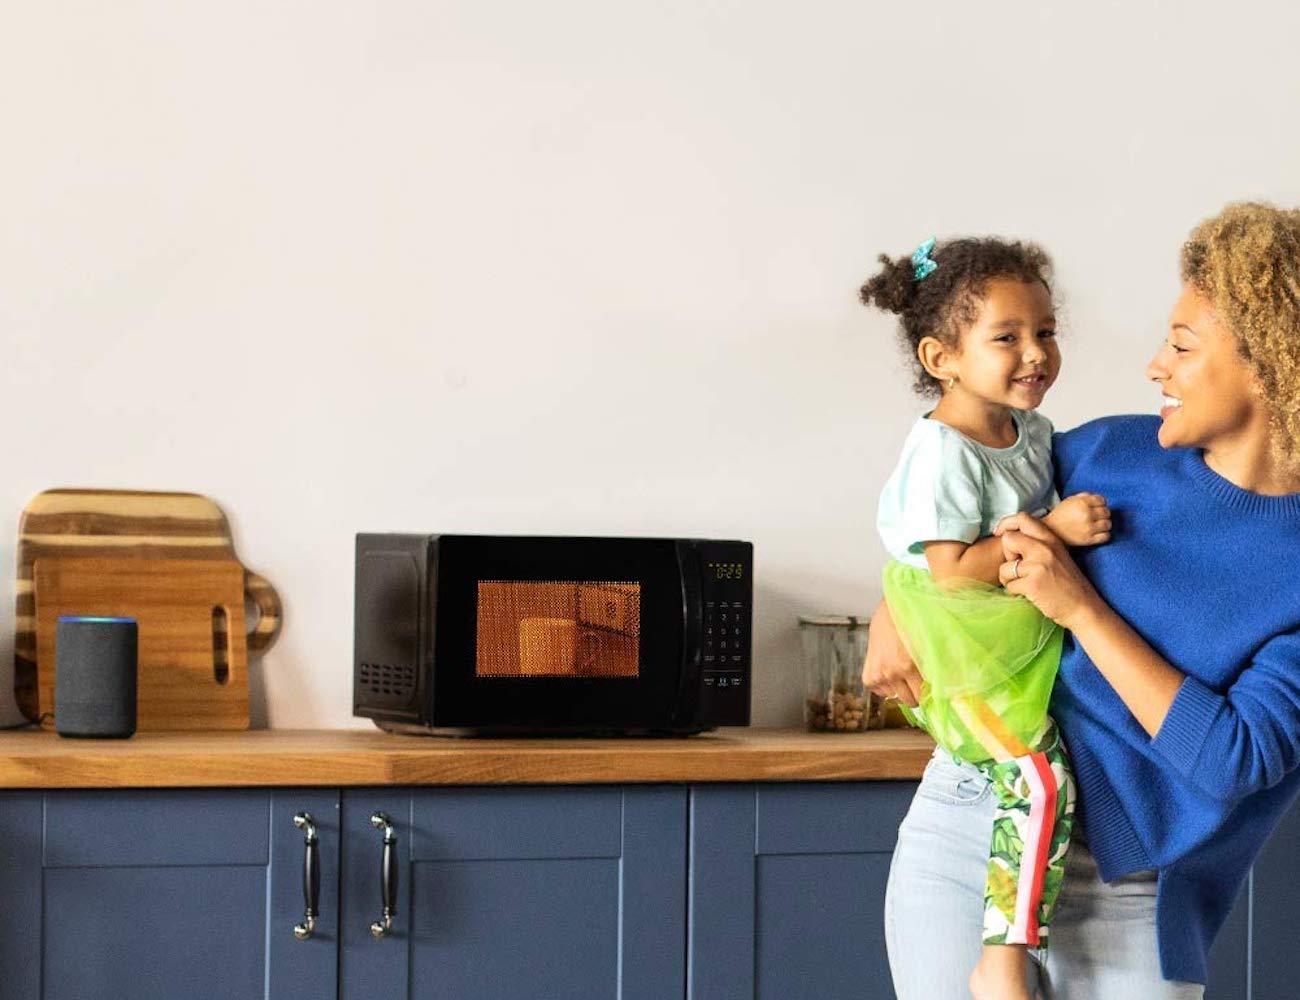 AmazonBasics Alexa Voice Controlled Microwave